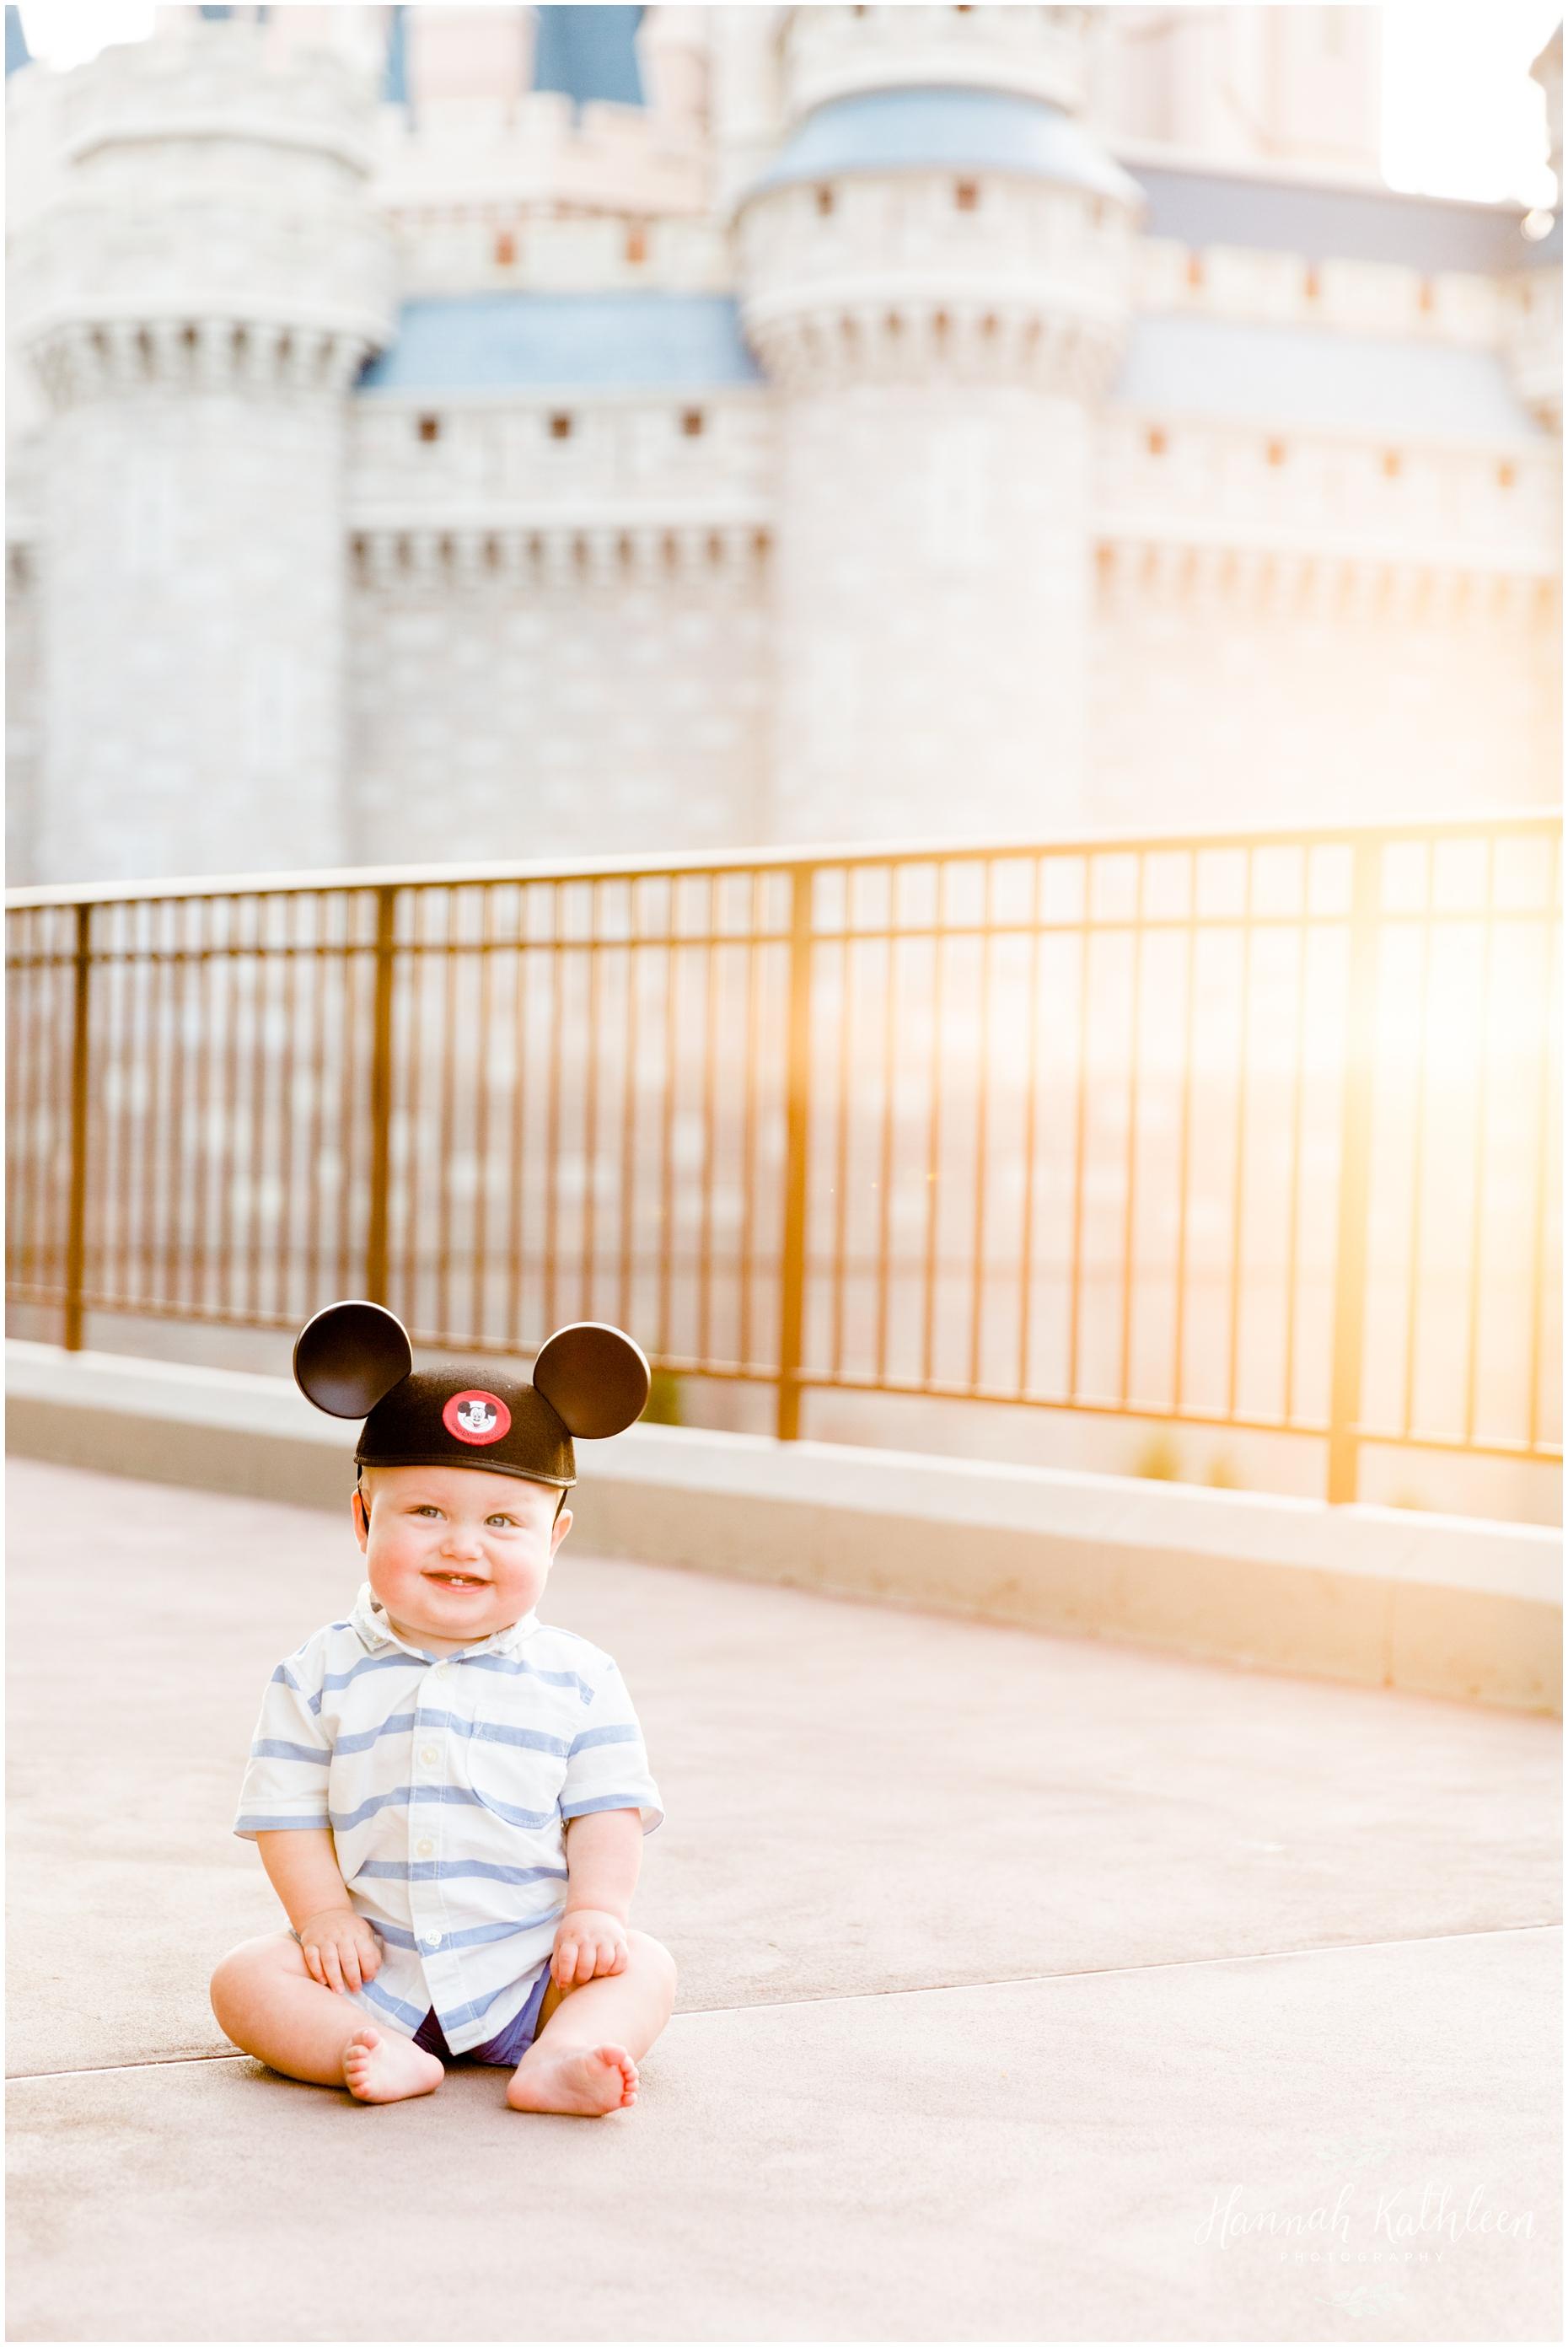 Mel_Lewy_One_Year_Disney_World_Photo_Session_Magic_Kingdom